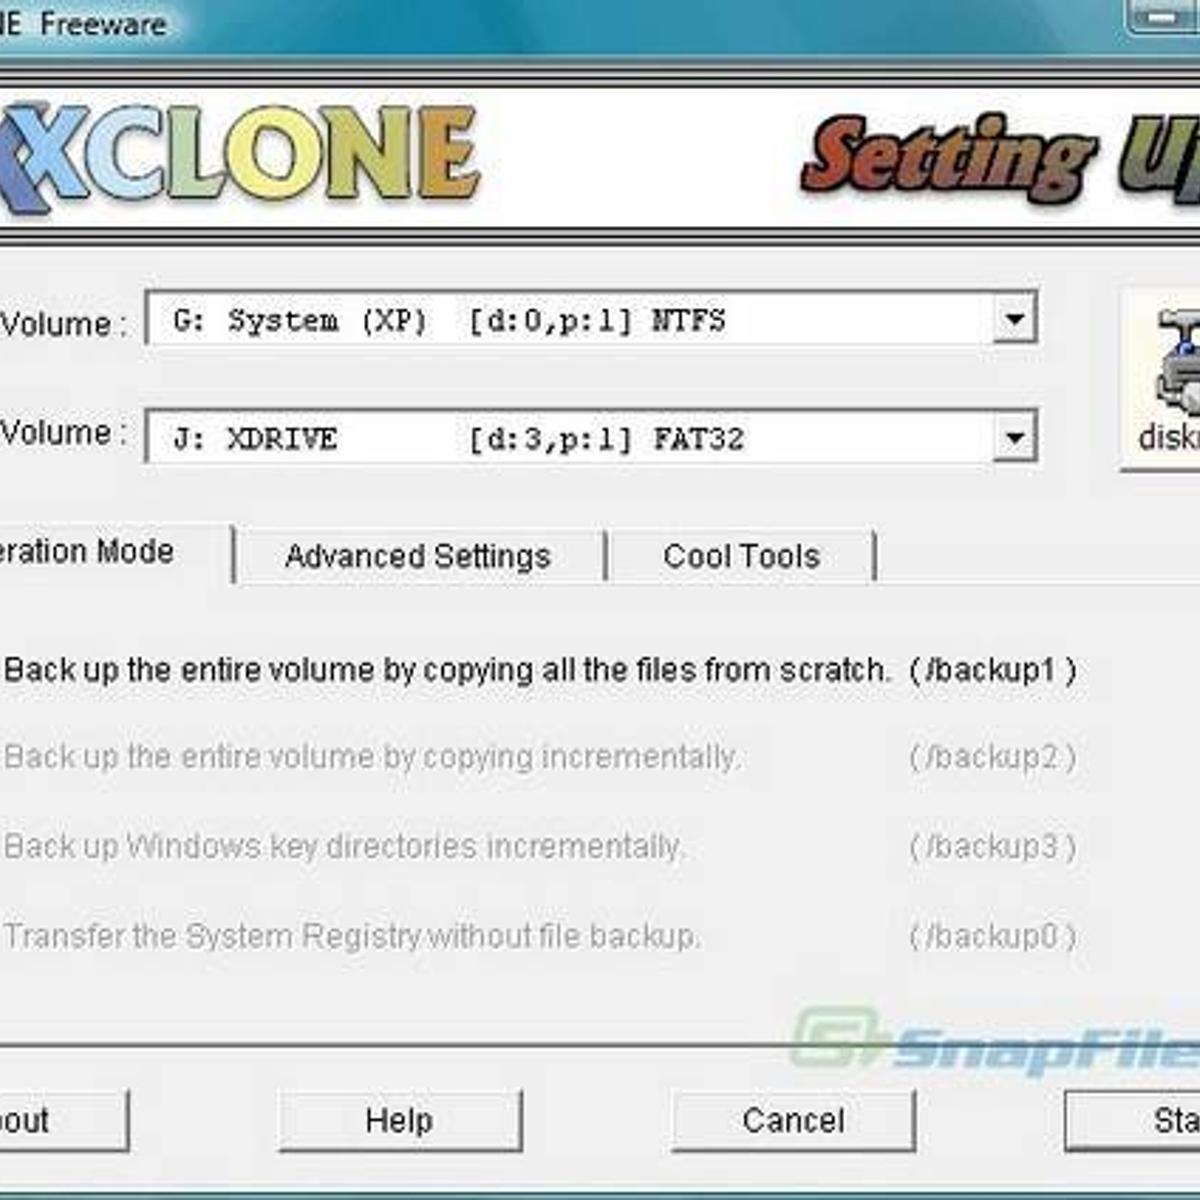 xxclone pro edition